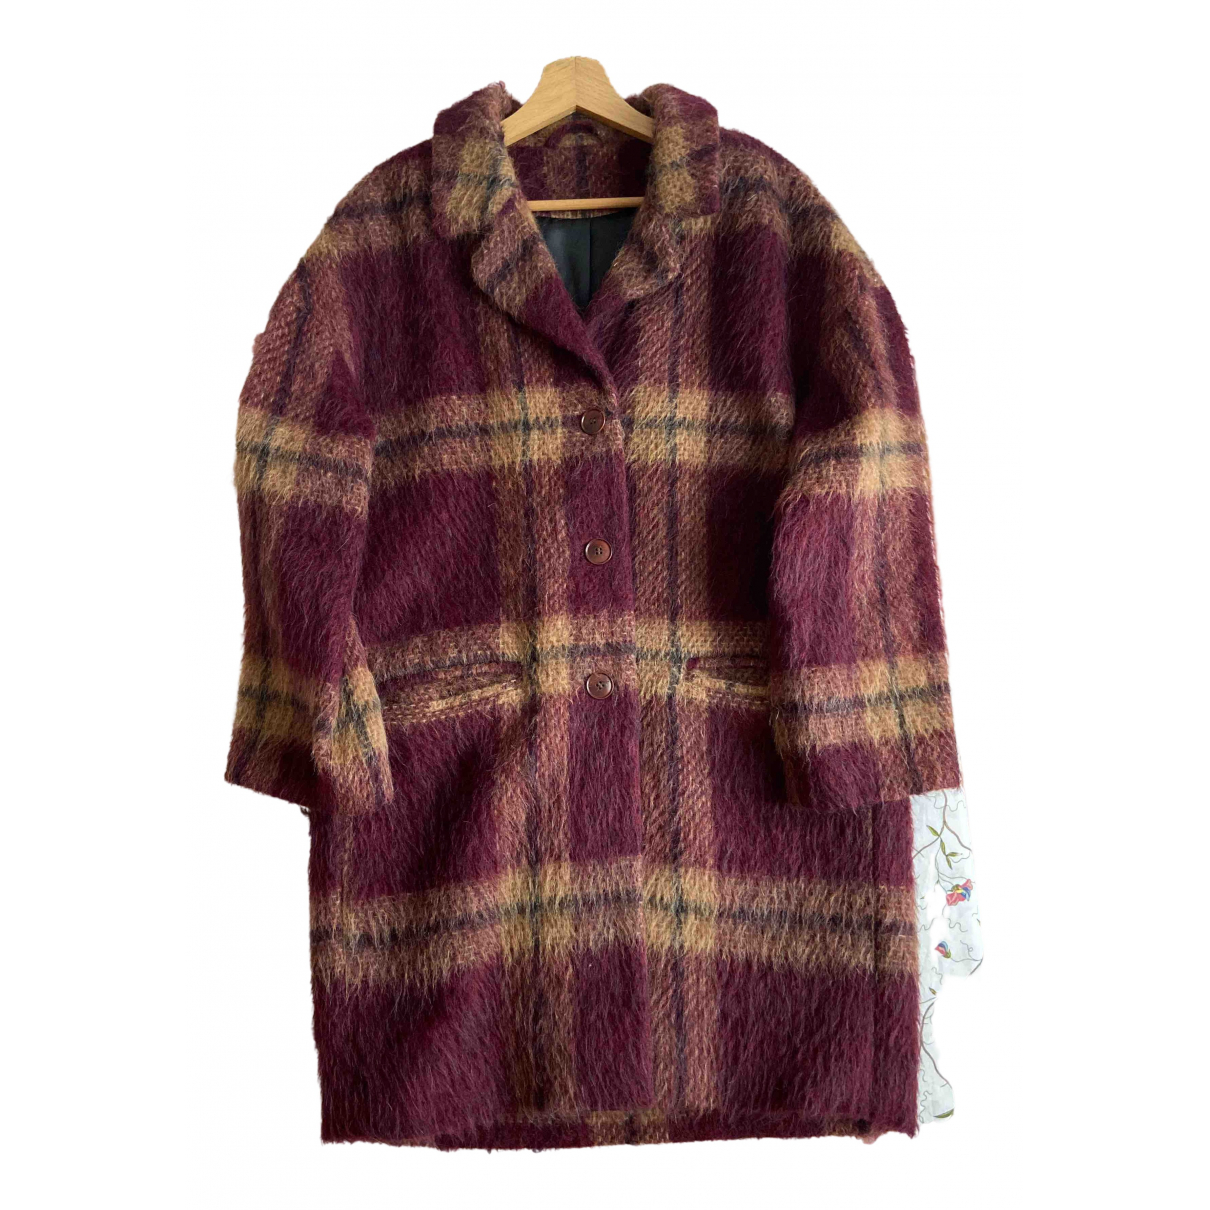 & Stories \N Purple Wool coat for Women 10 US